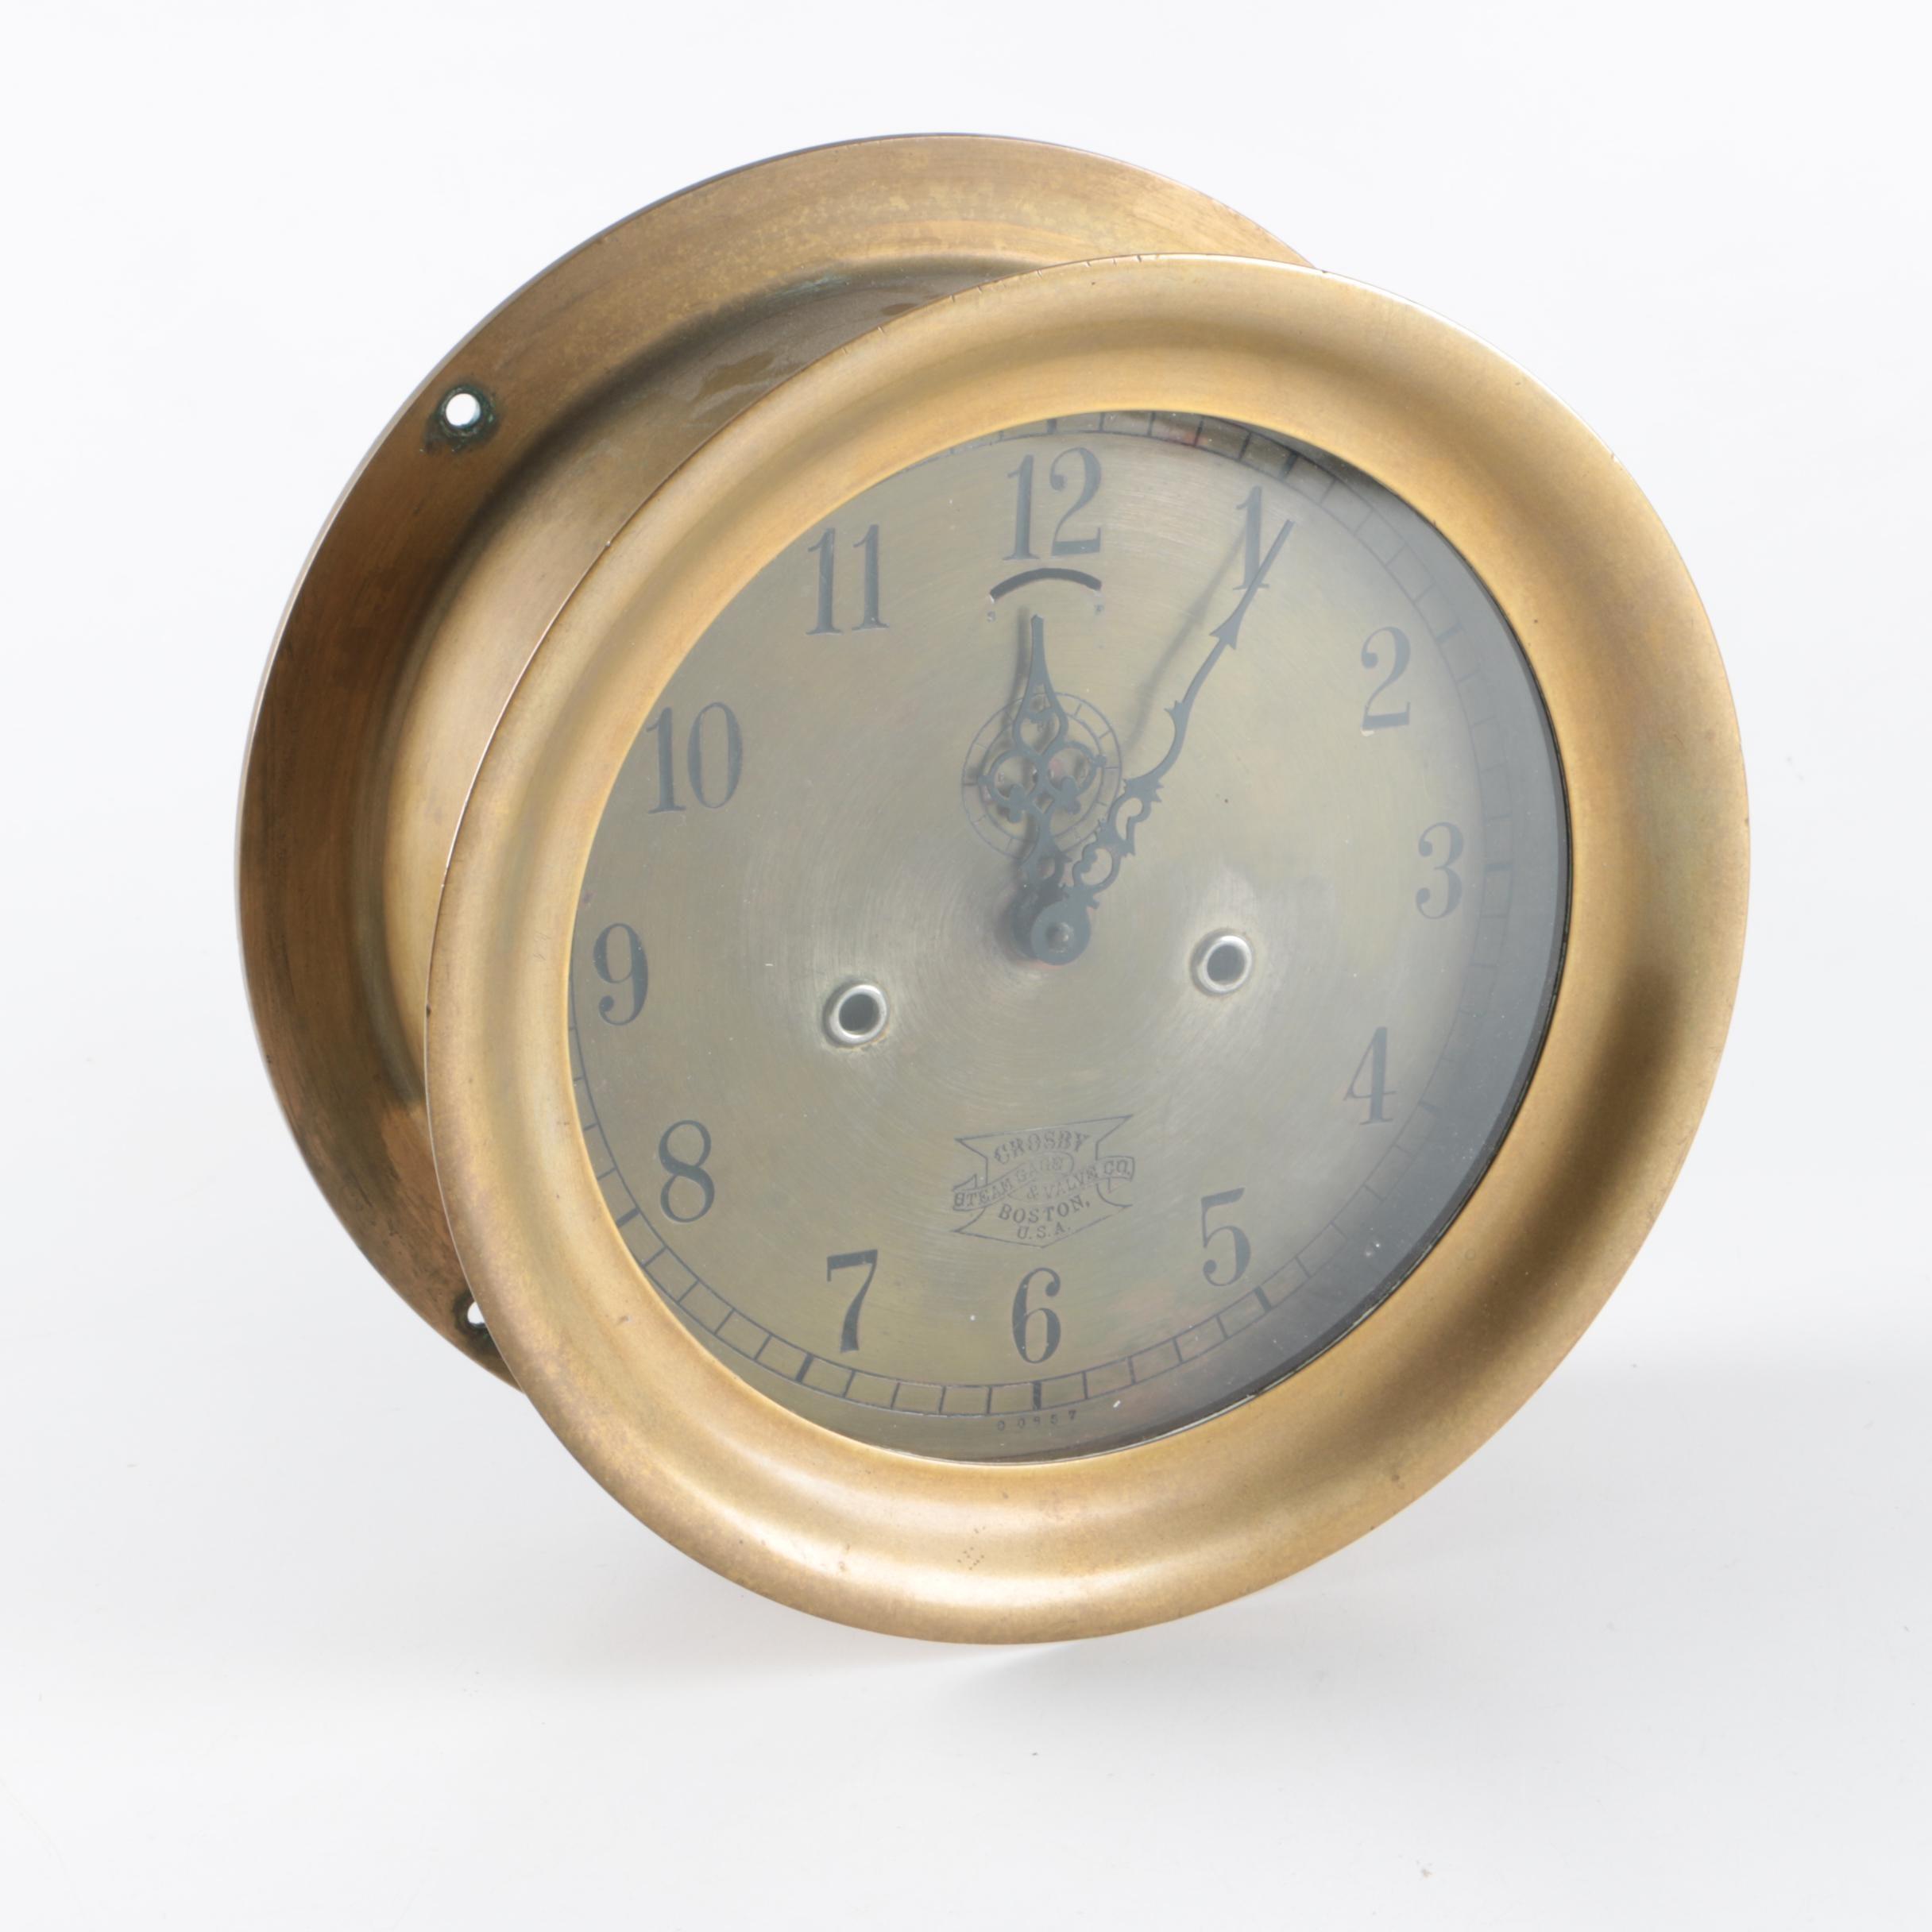 Crosby Steam Gauge & Valve Co. Wall Clock